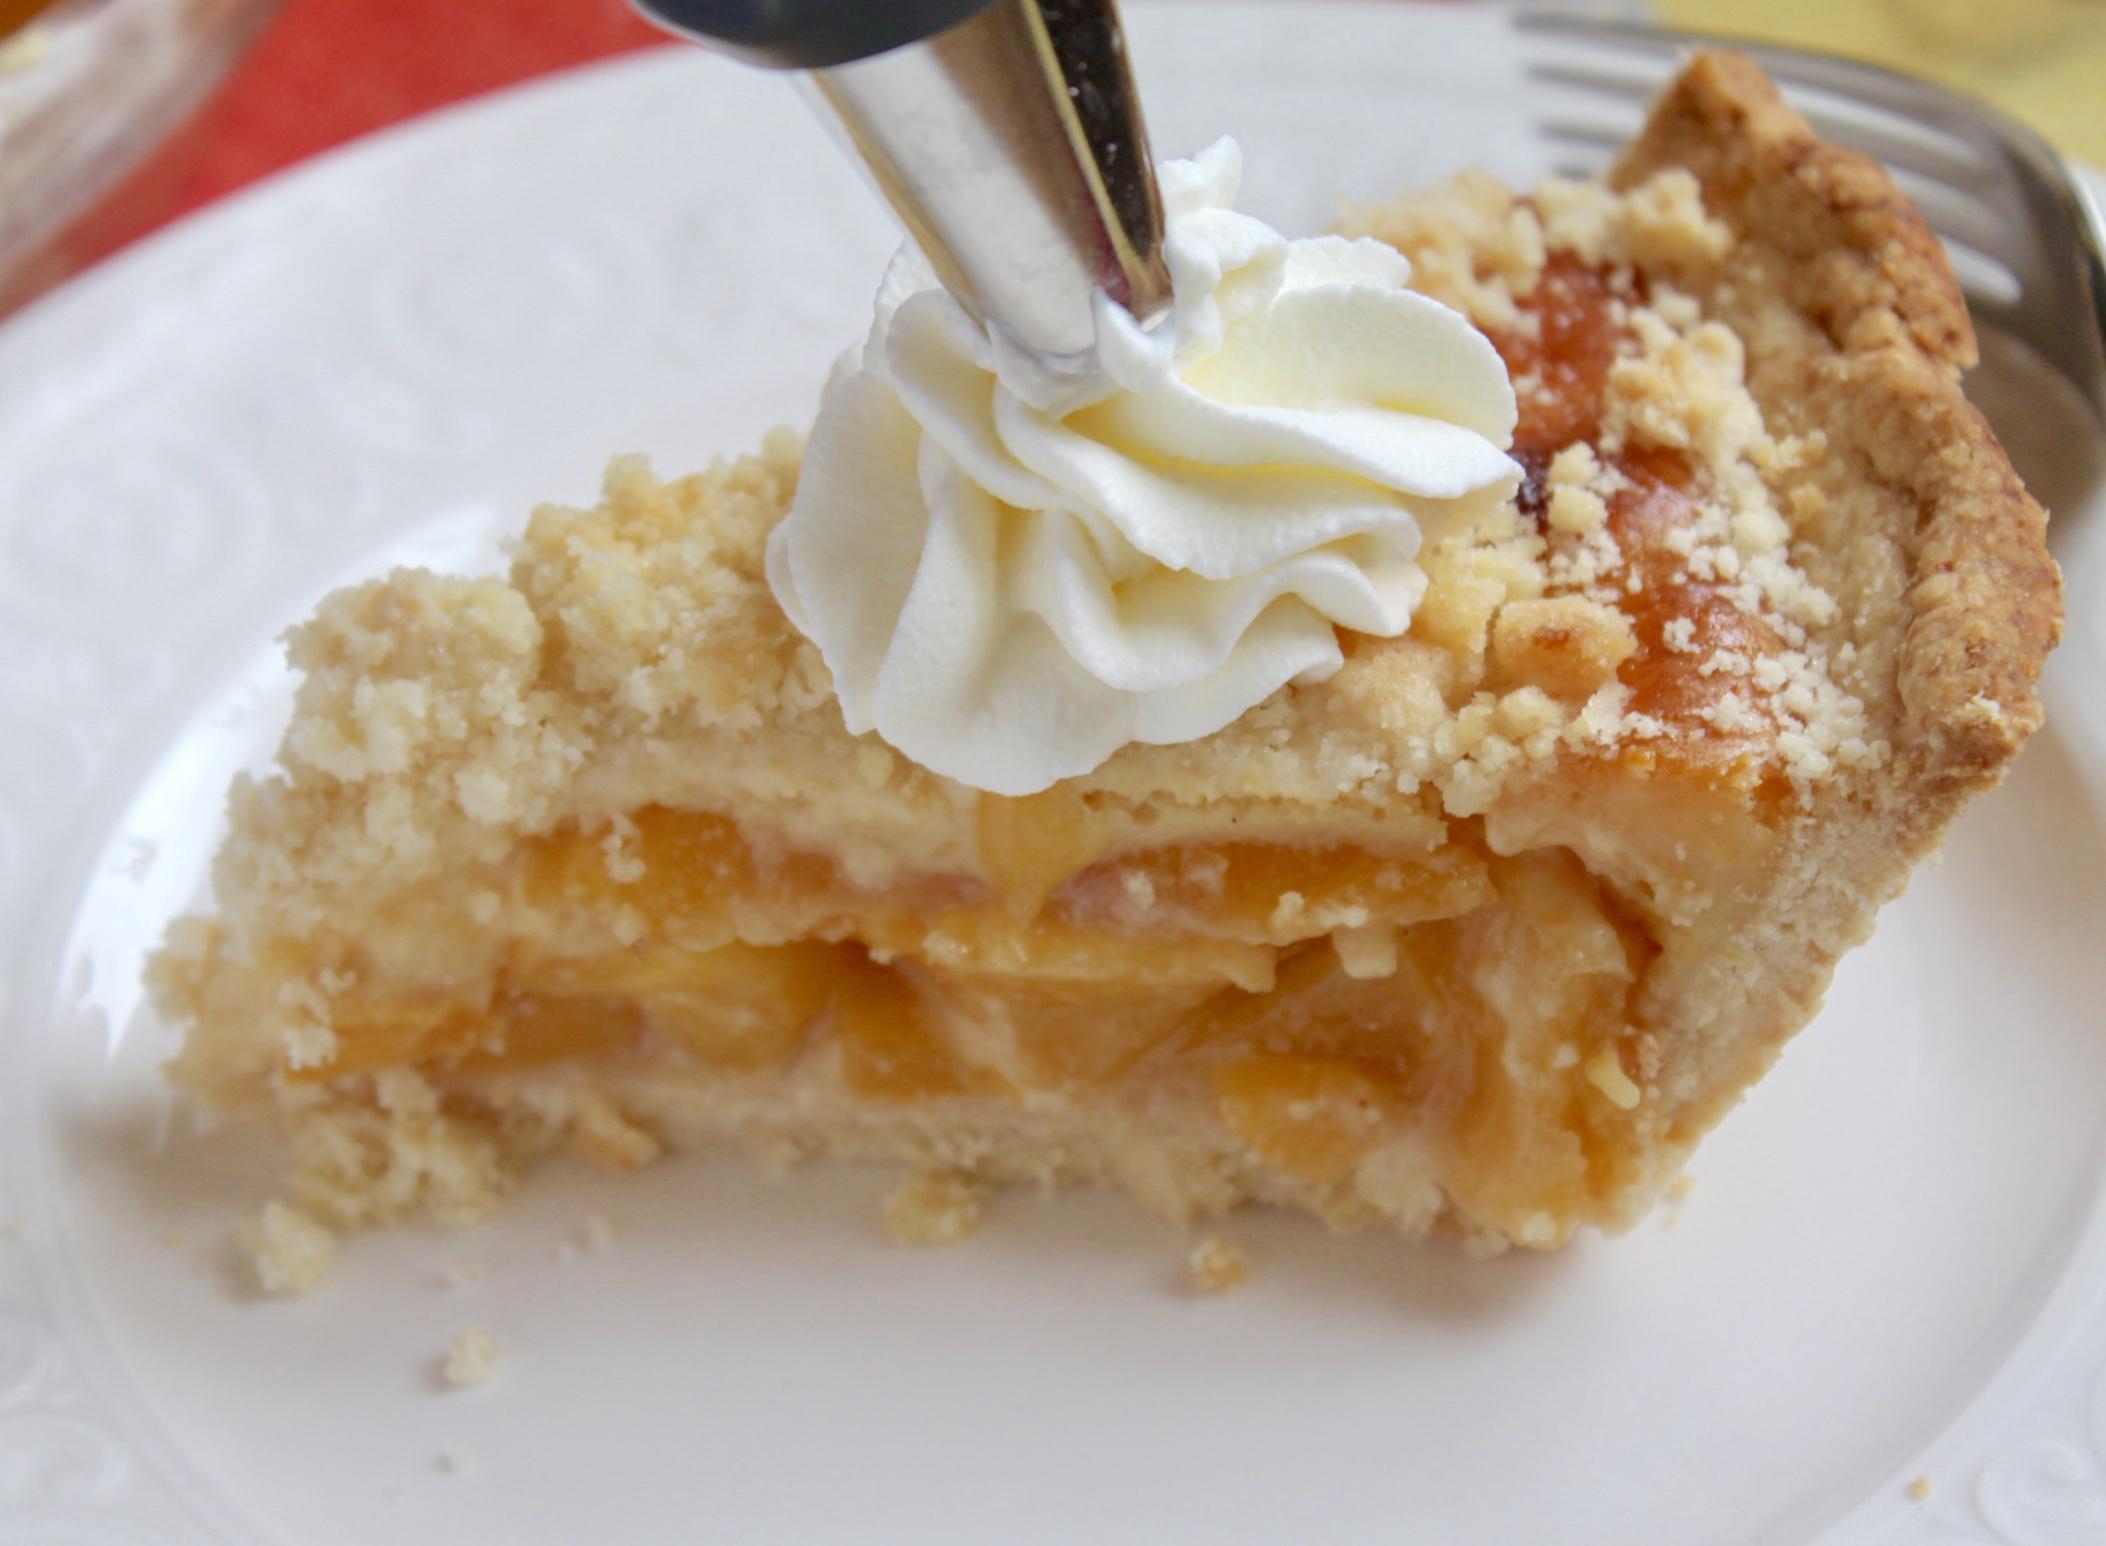 adding cream to slice of custard peach pie